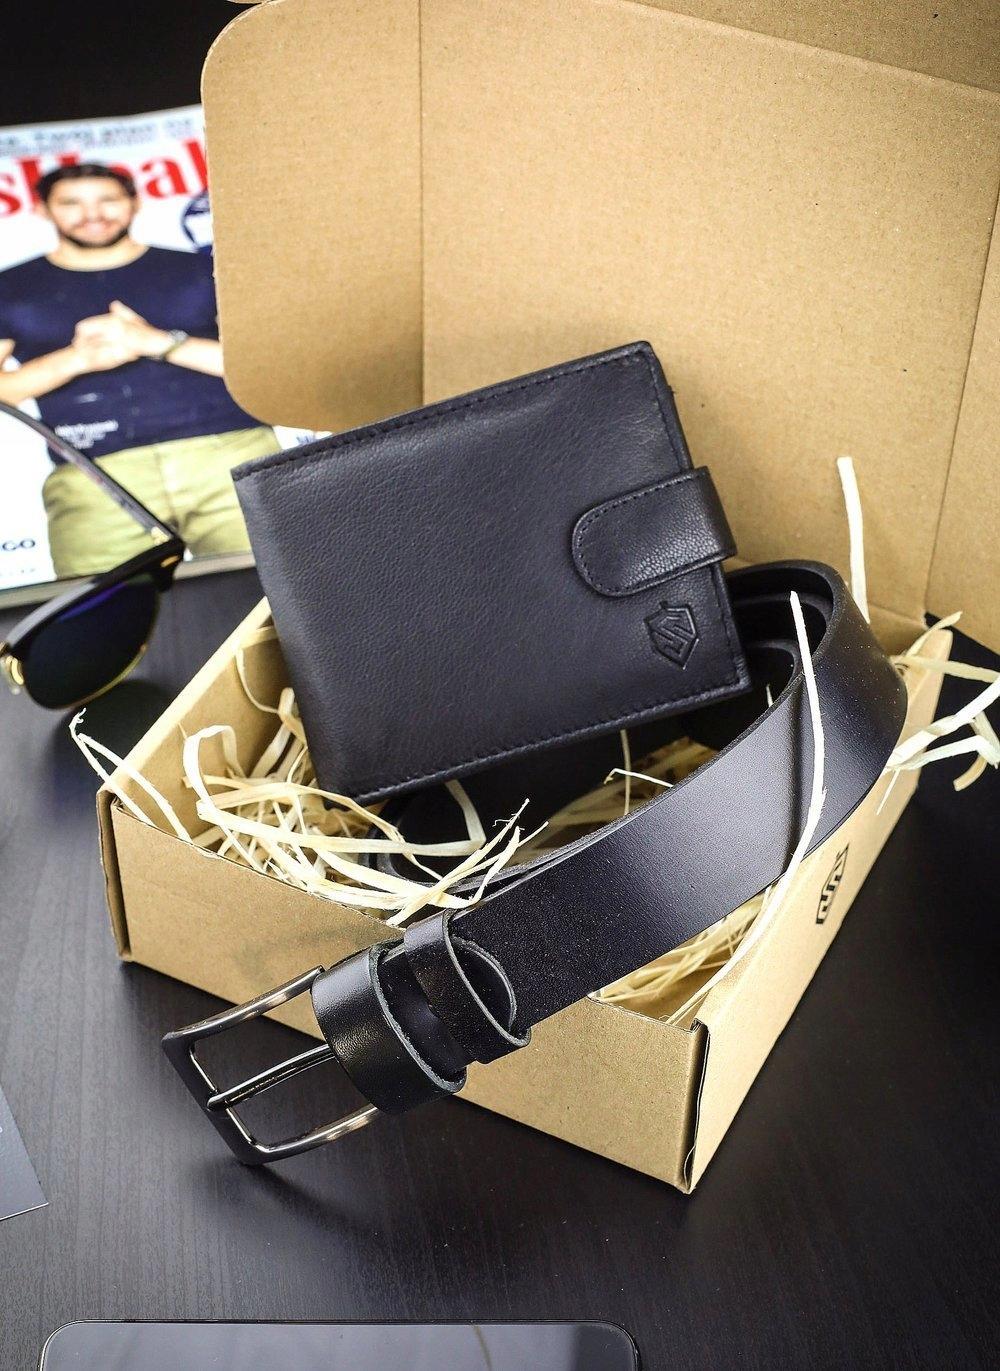 STEVENS GIFT SET Wallet Men's belt LEATHER A type of classic buckle